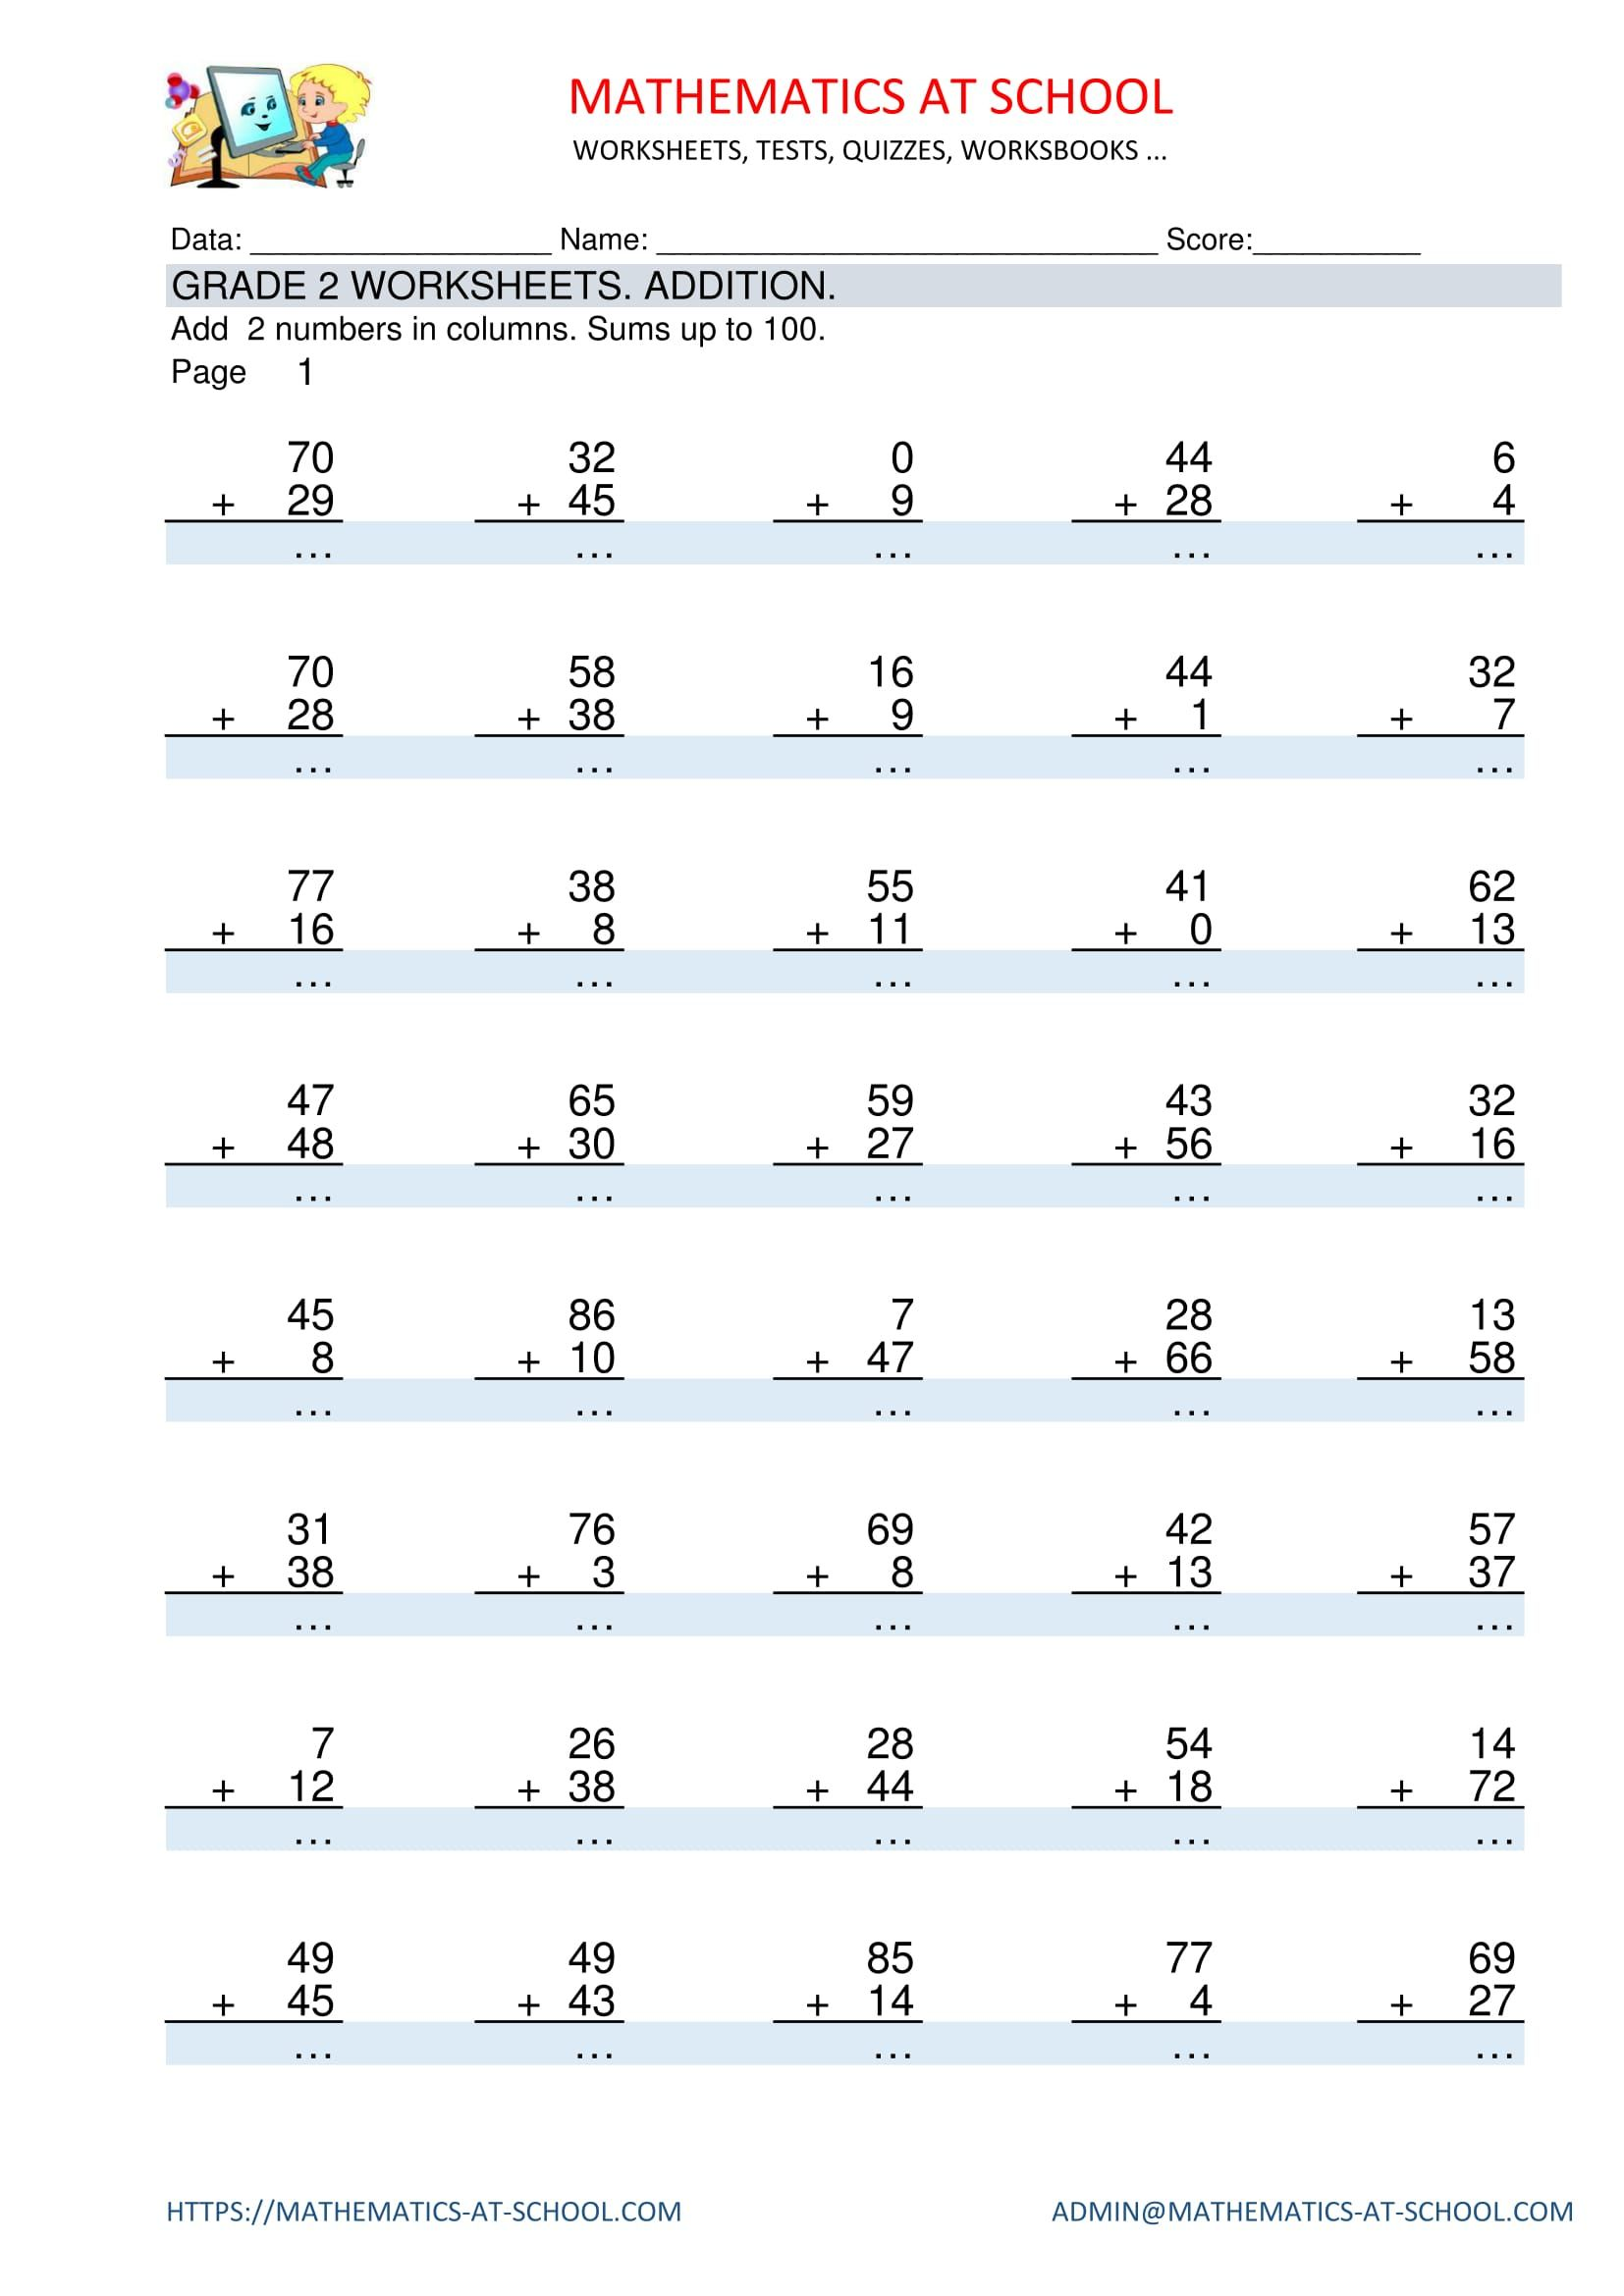 8 Grade 2 maths worksheets and free download printable pdf sheets ideas    math worksheet [ 2339 x 1654 Pixel ]